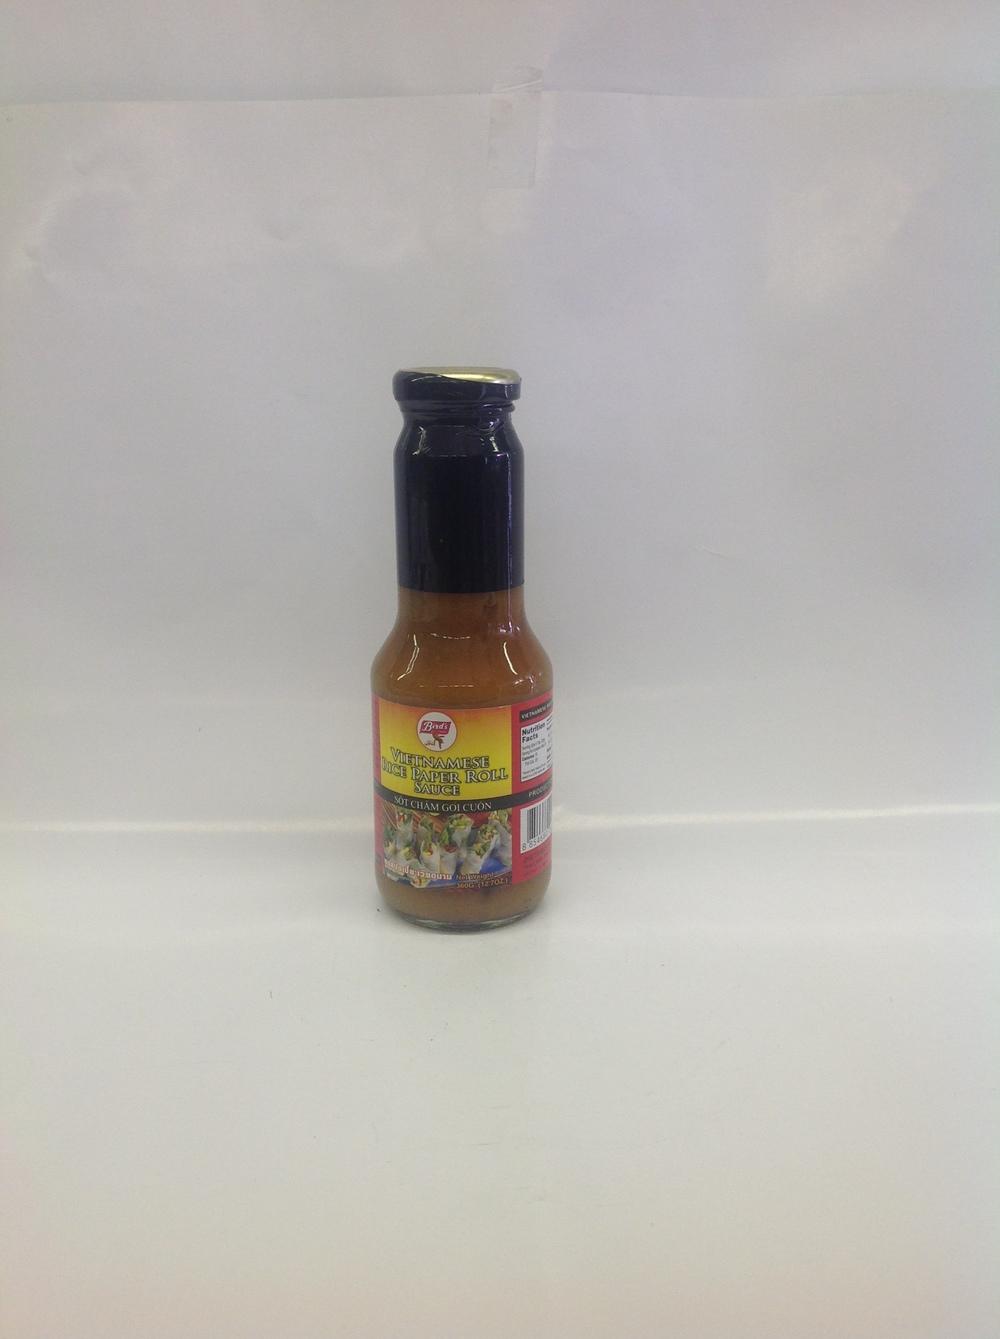 Vietnamese Rice Paper Roll Sauce   Bird's   SC16300 24x12 oz